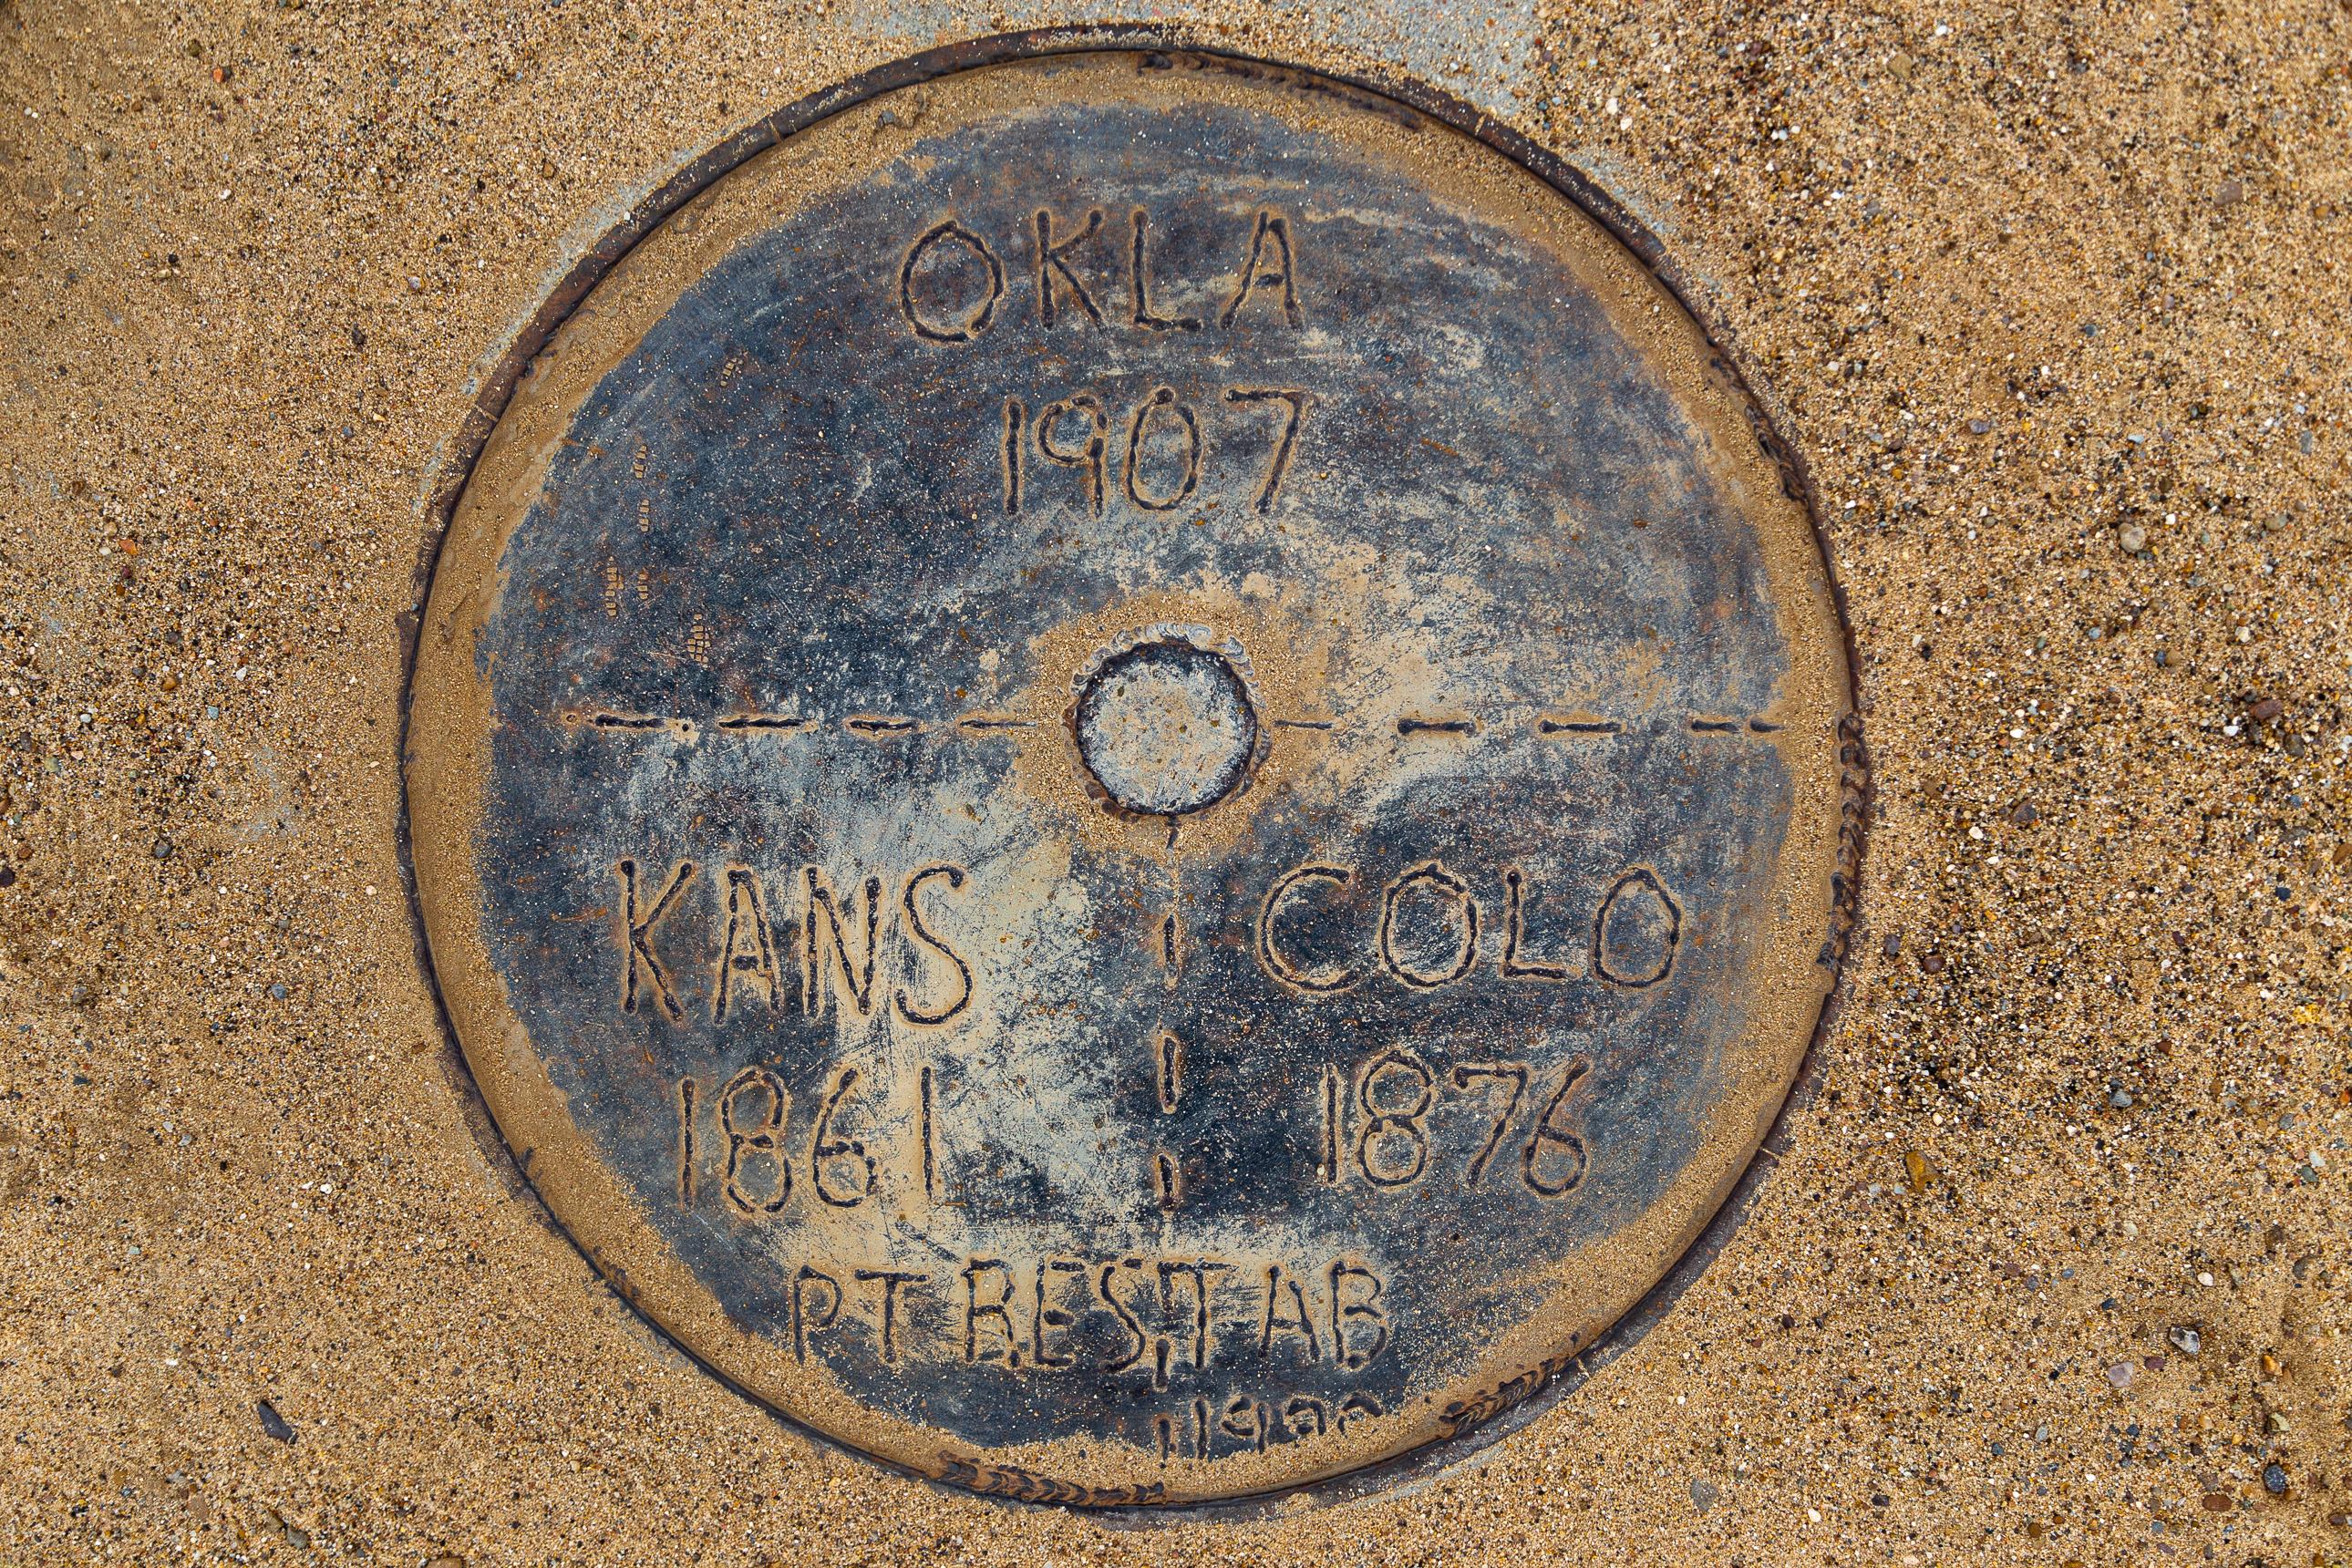 Tripoint marker where Kansas, Oklahoma and Colorado meet